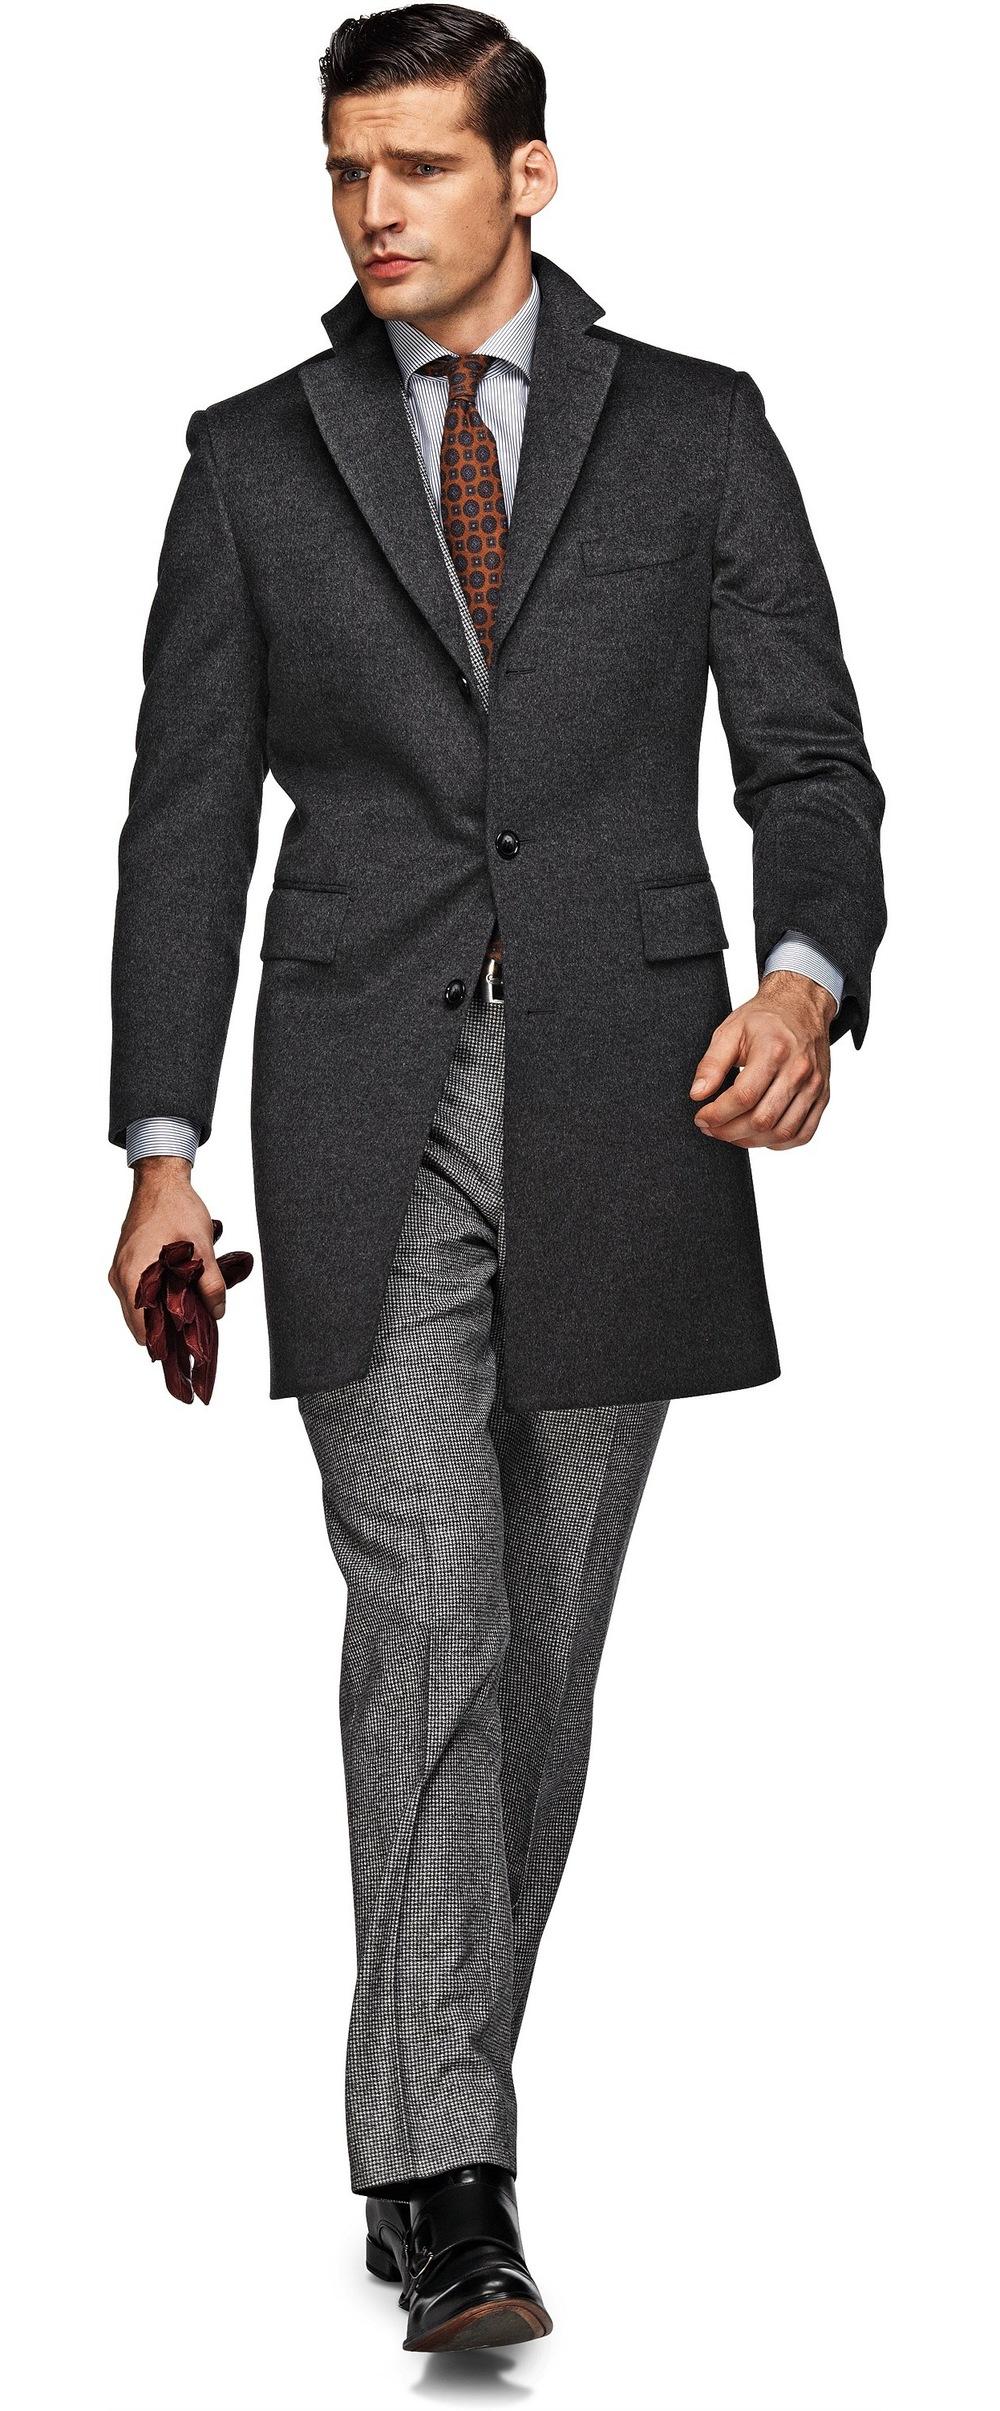 Coats__J247_Suitsupply_Online_Store_1.jpg